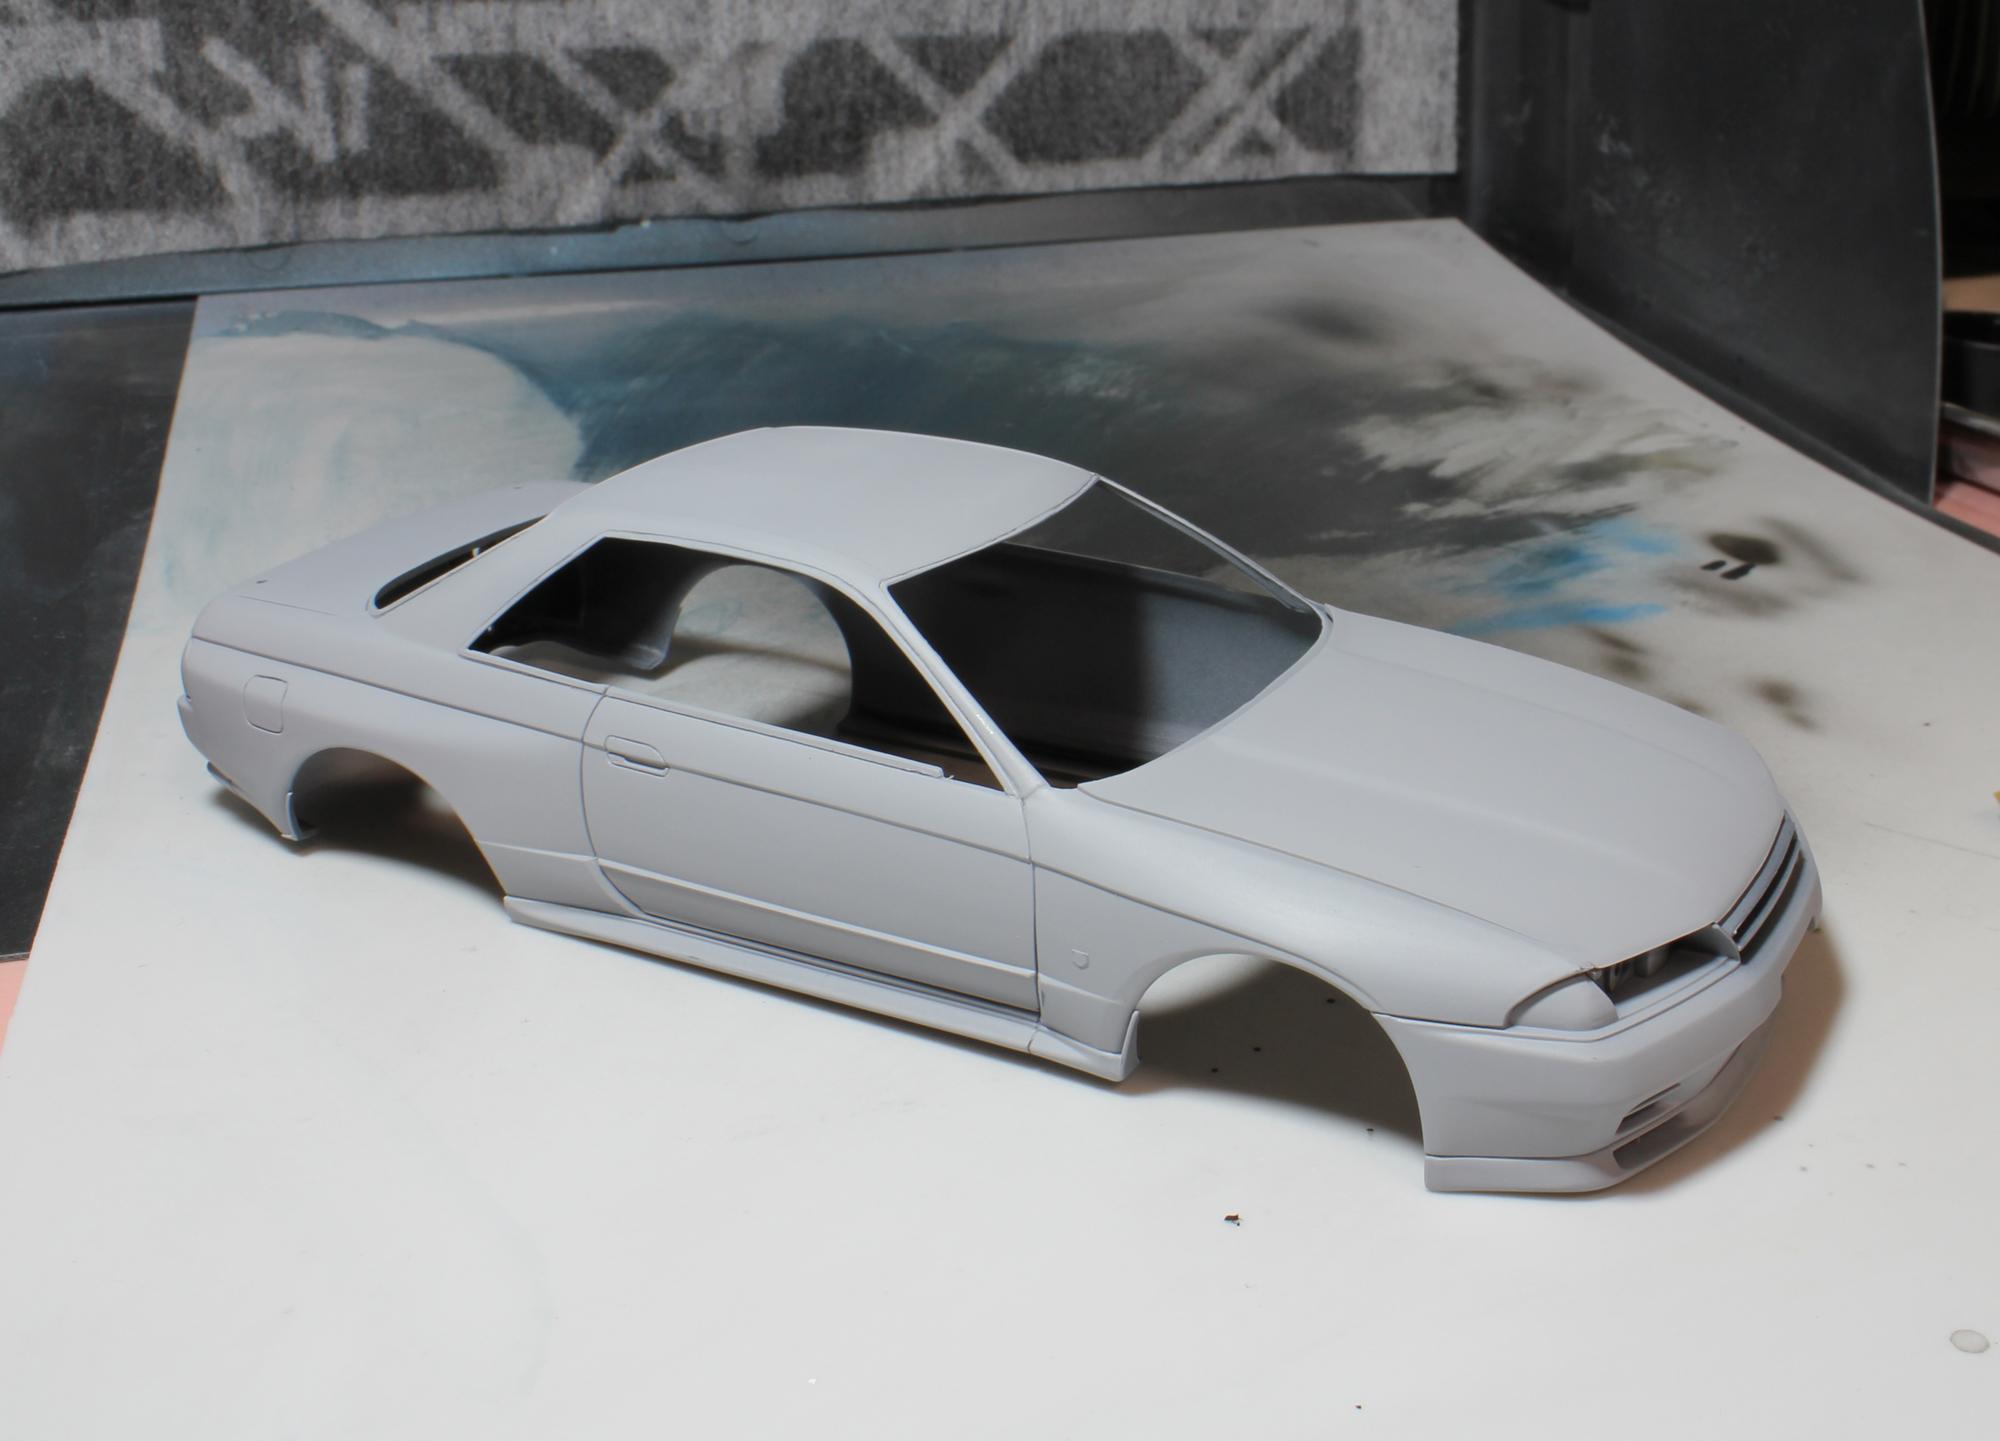 R32ボディー修正サフ後3